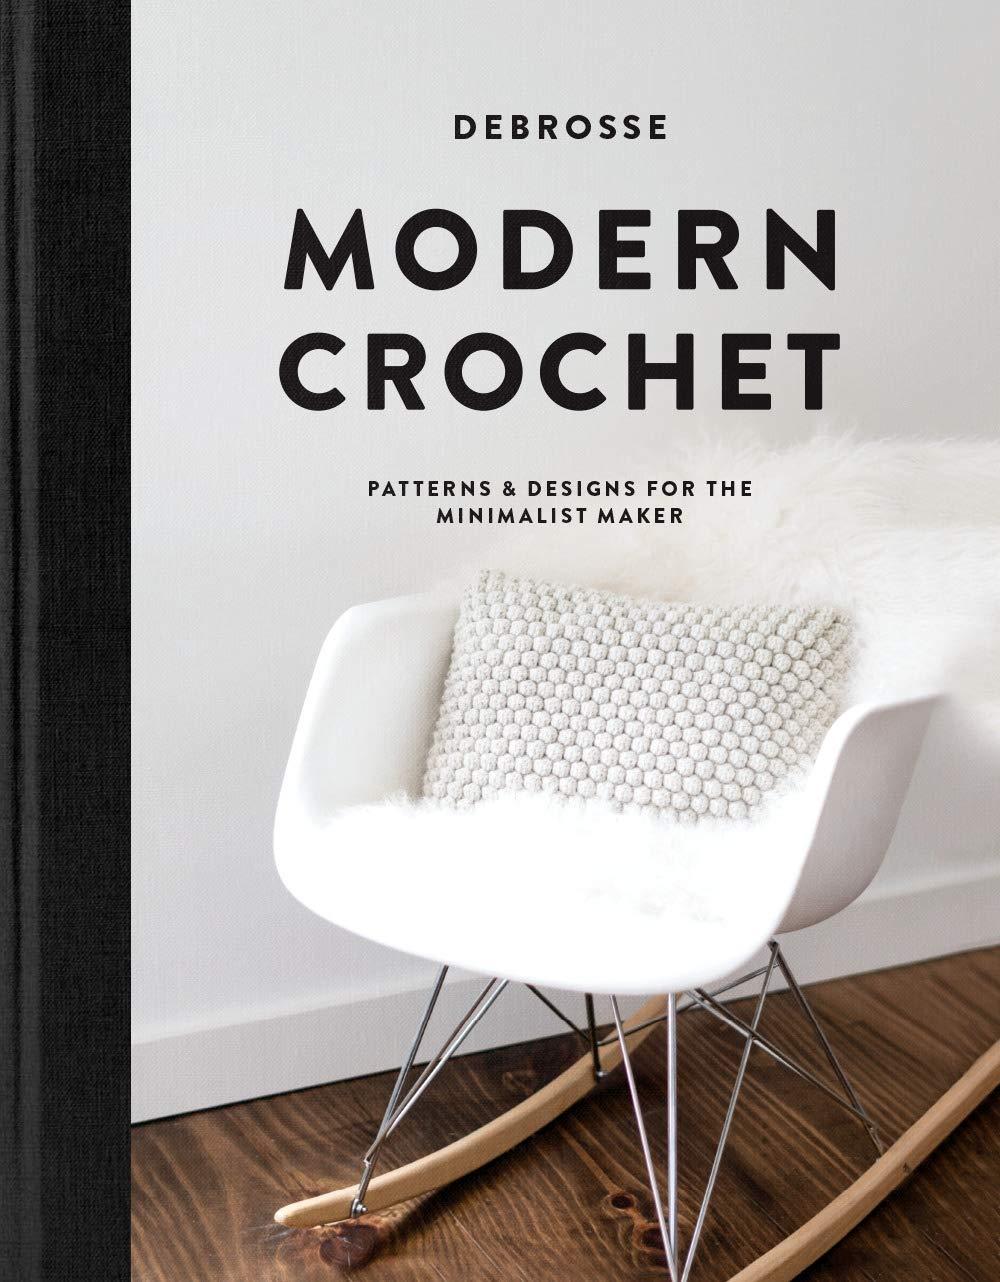 Lost in Time – Mijo Crochet | 1282x1000